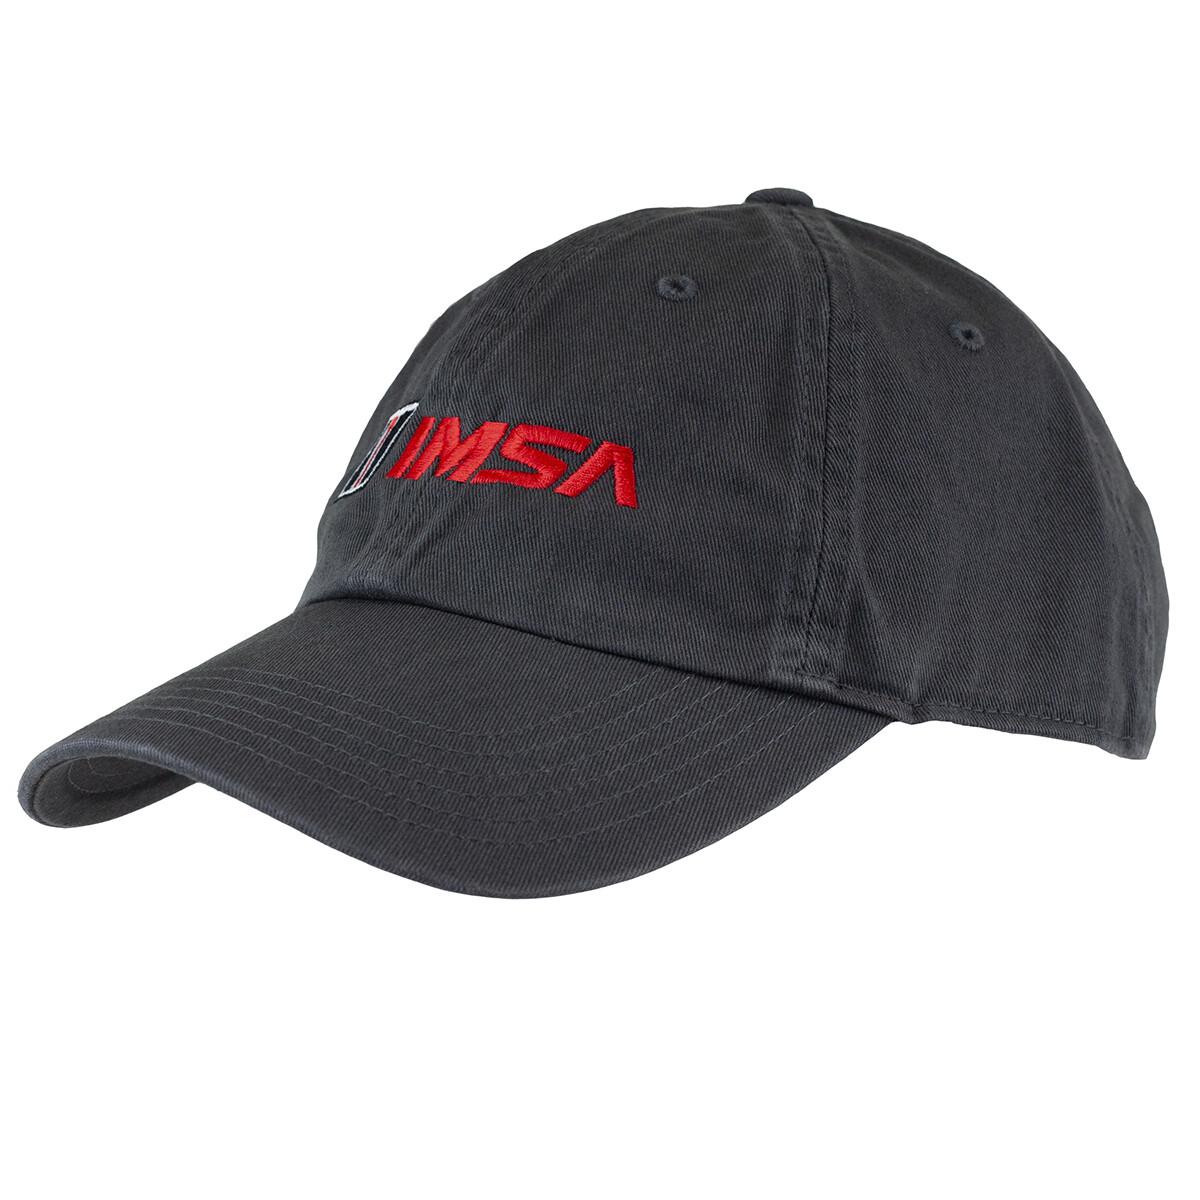 IMSA Dad Hat - Charcoal